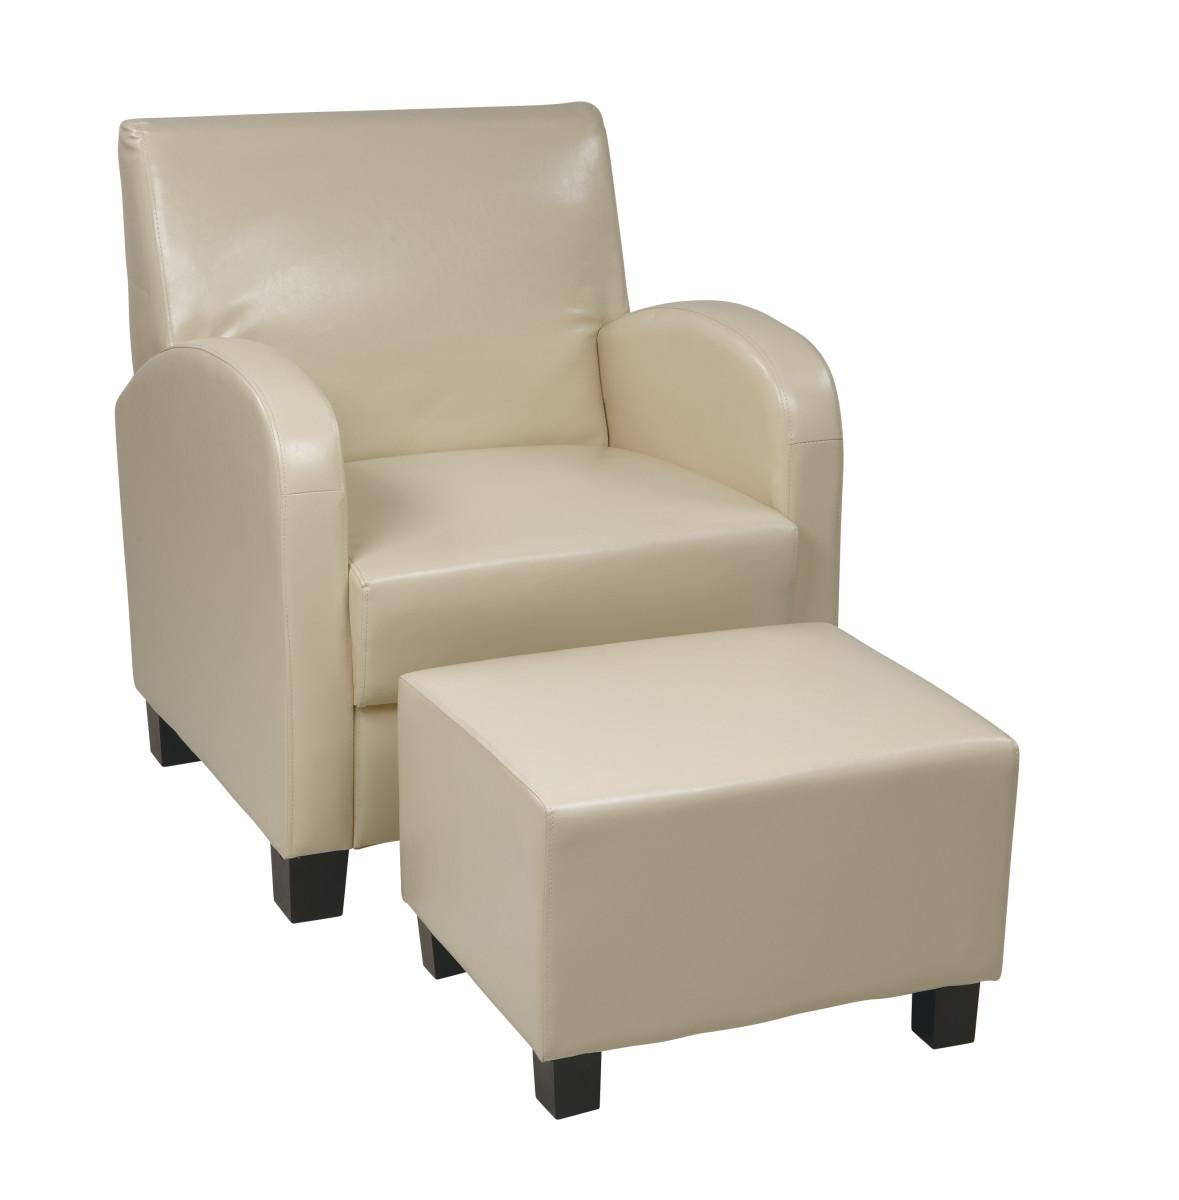 Cream Faux Leather Club Chair with Ottoman  Ergobackcom